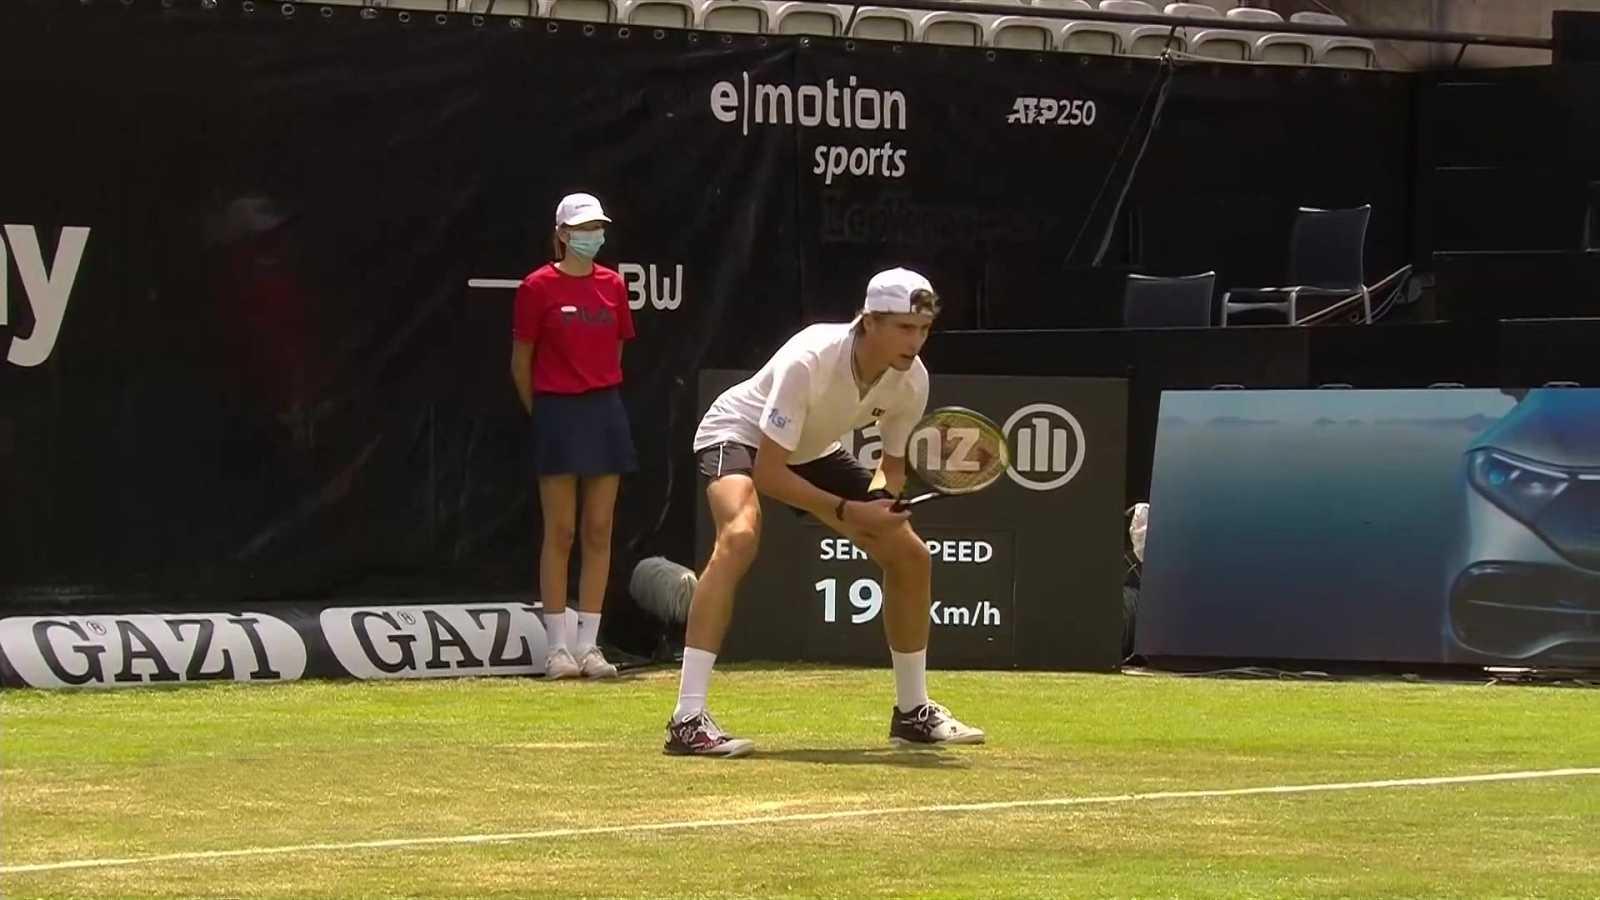 Tenis - ATP 250 Torneo Stuttgart: Ugo Humbert - Yannick Hanfmann - ver ahora